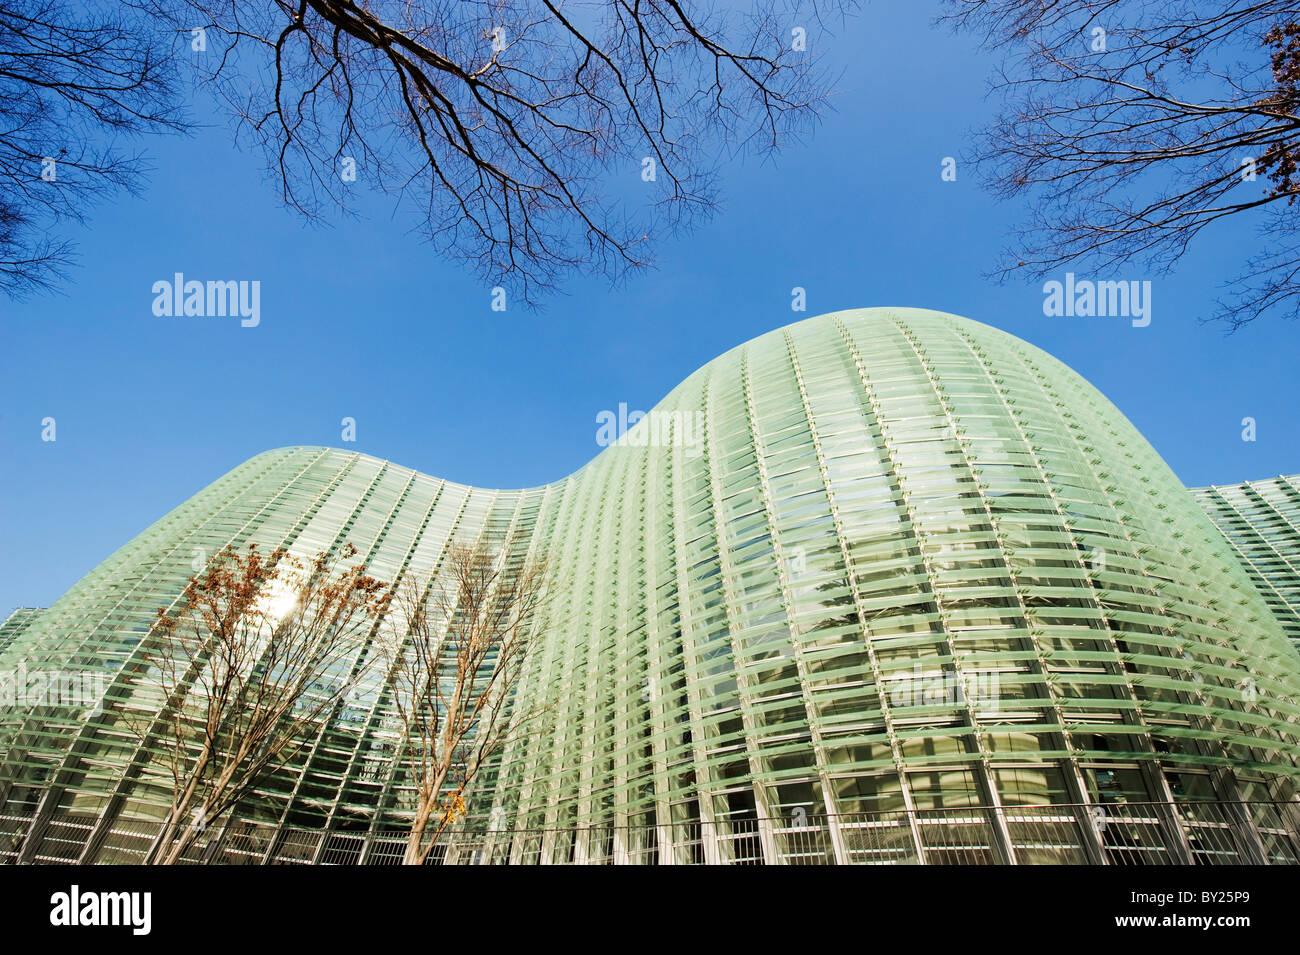 L'Asie, Japon, Tokyo, Roppongi ward, National Art Center, Tokyo Tower, conçue par Kisho Kurokawa (2007) Banque D'Images